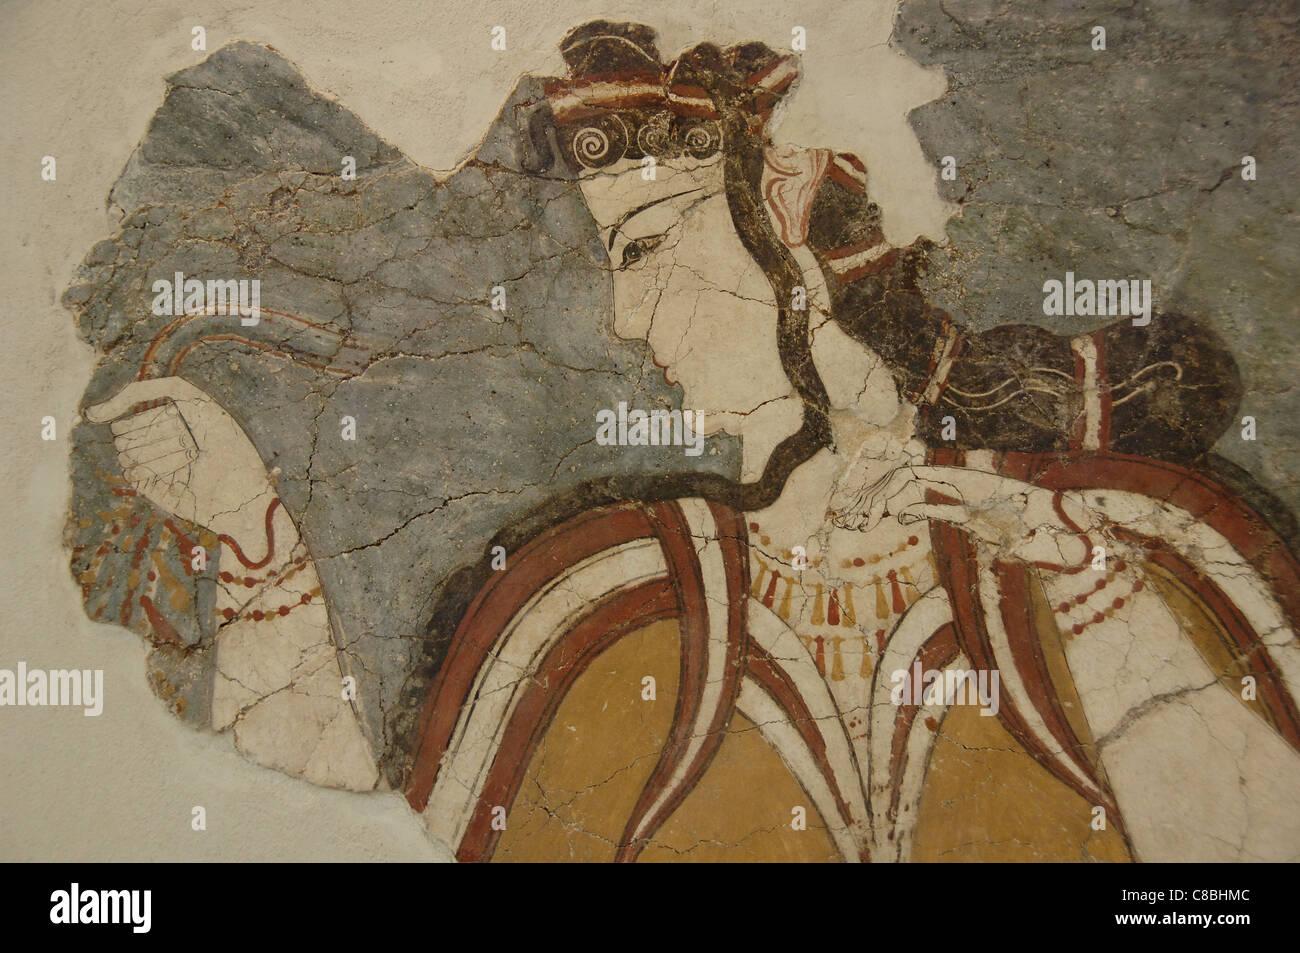 Mycenaean art. Greece. Fresco of the Lady of Mycenae or the Mycenaean. 13th century B.C. It depicts a goddess. - Stock Image